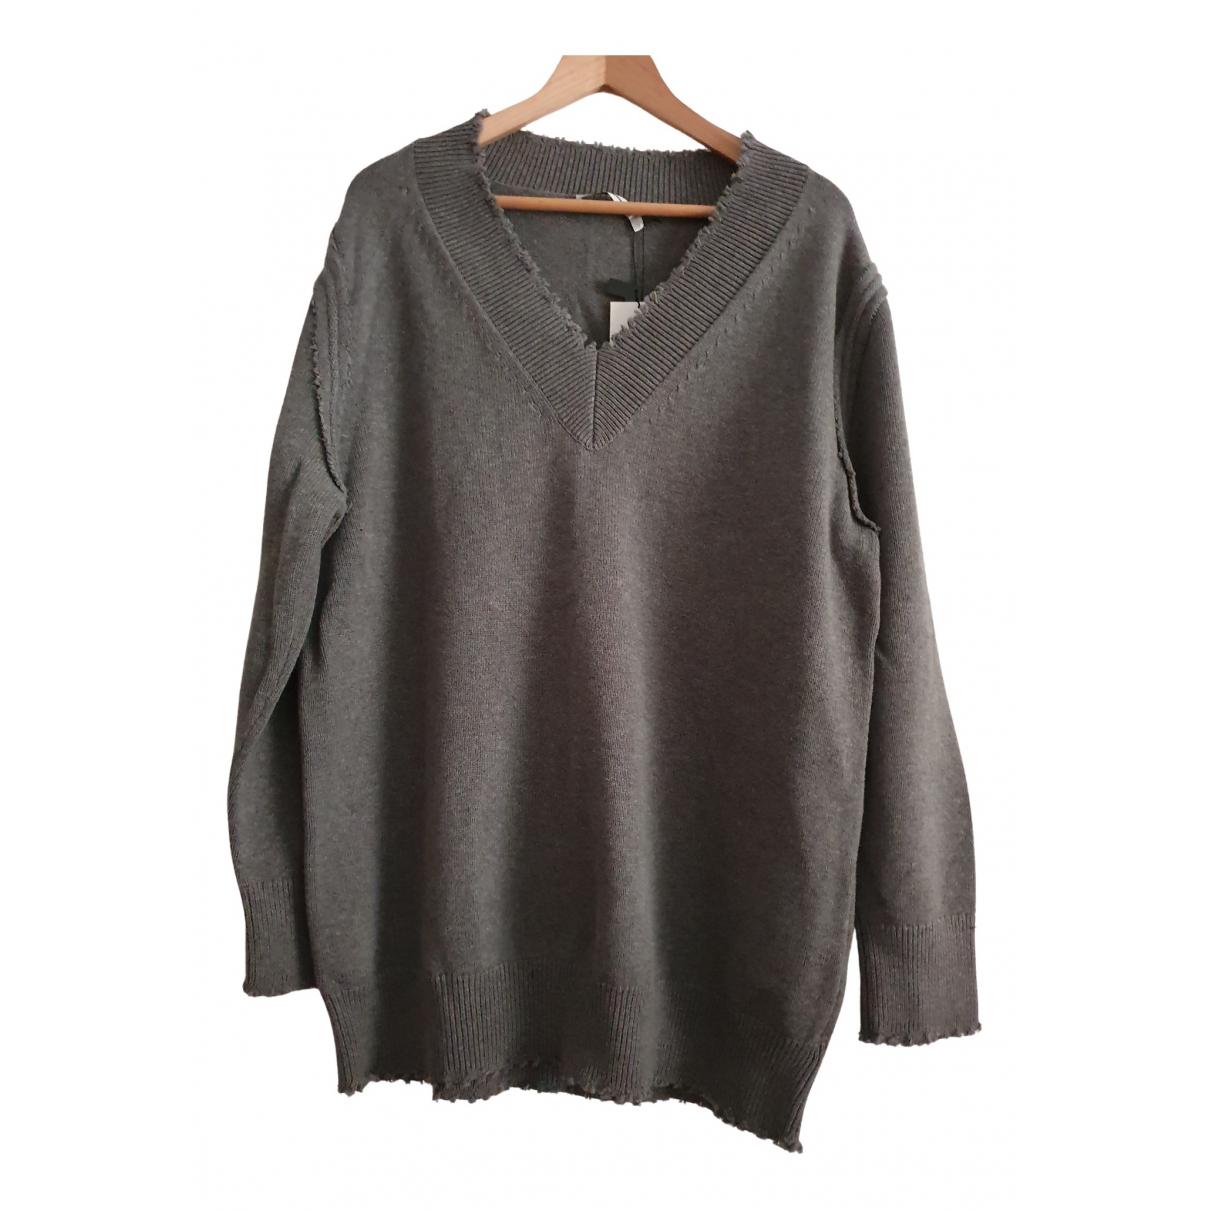 T By Alexander Wang N Grey Cotton Knitwear for Women M International